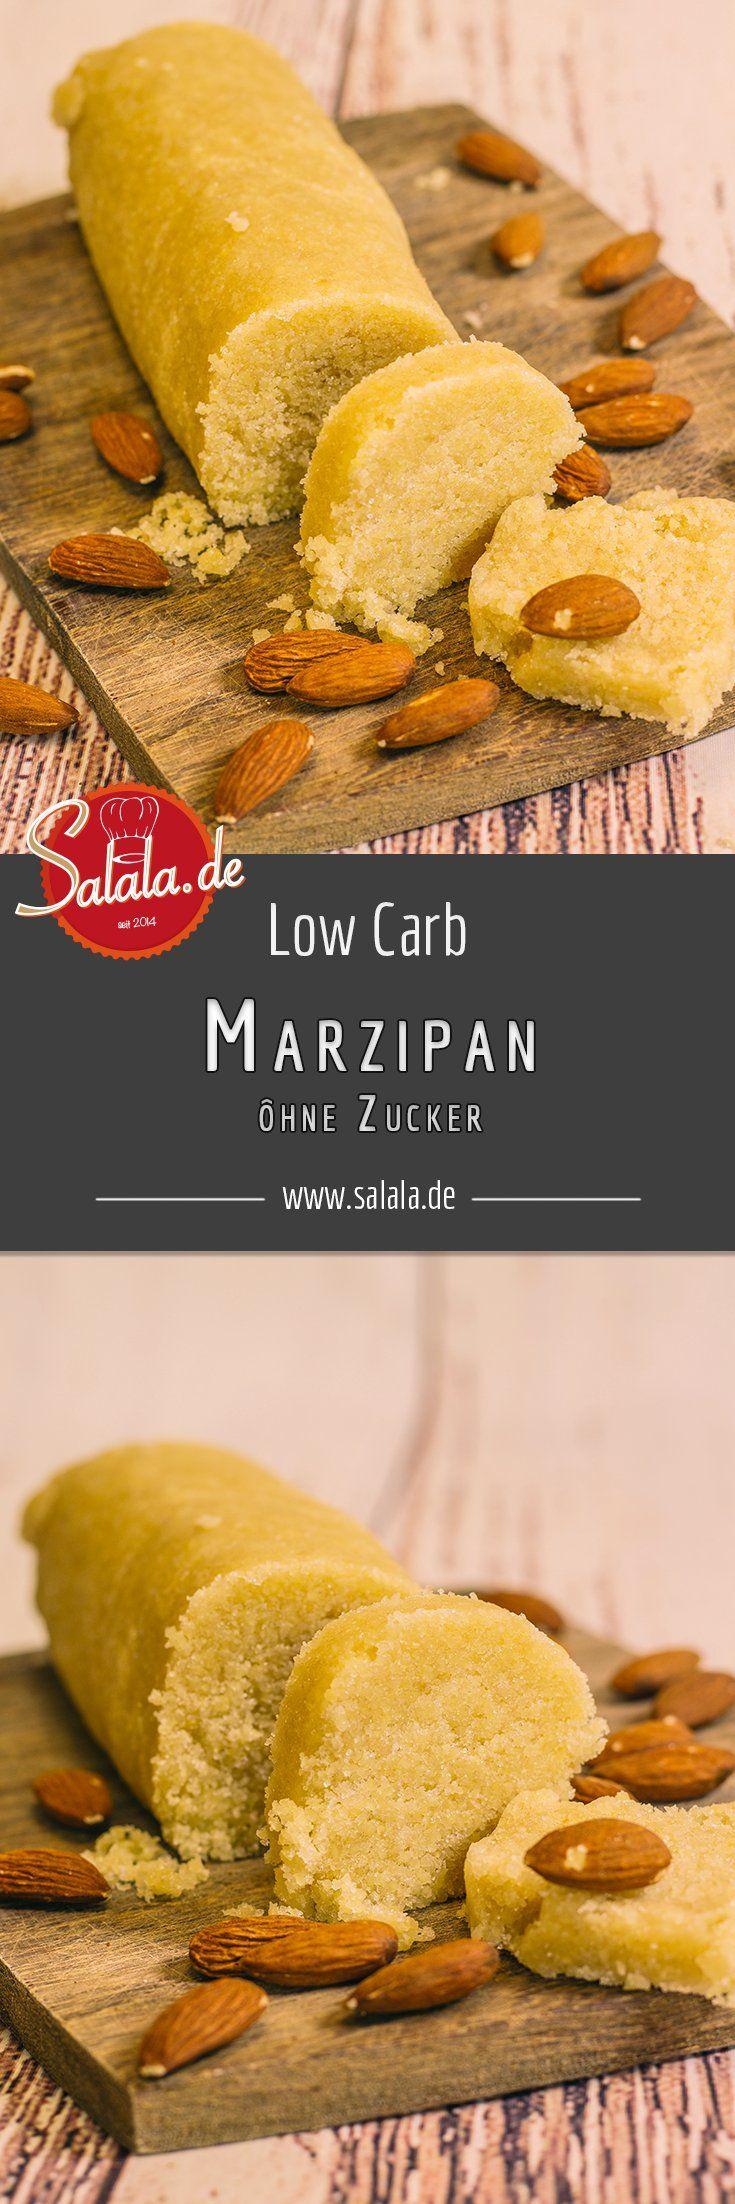 Low Carb Marzipan einfach selber machen - by salala.de - Marzipan ohne Zucker Low Carb glutenfrei zuckerfrei DIY